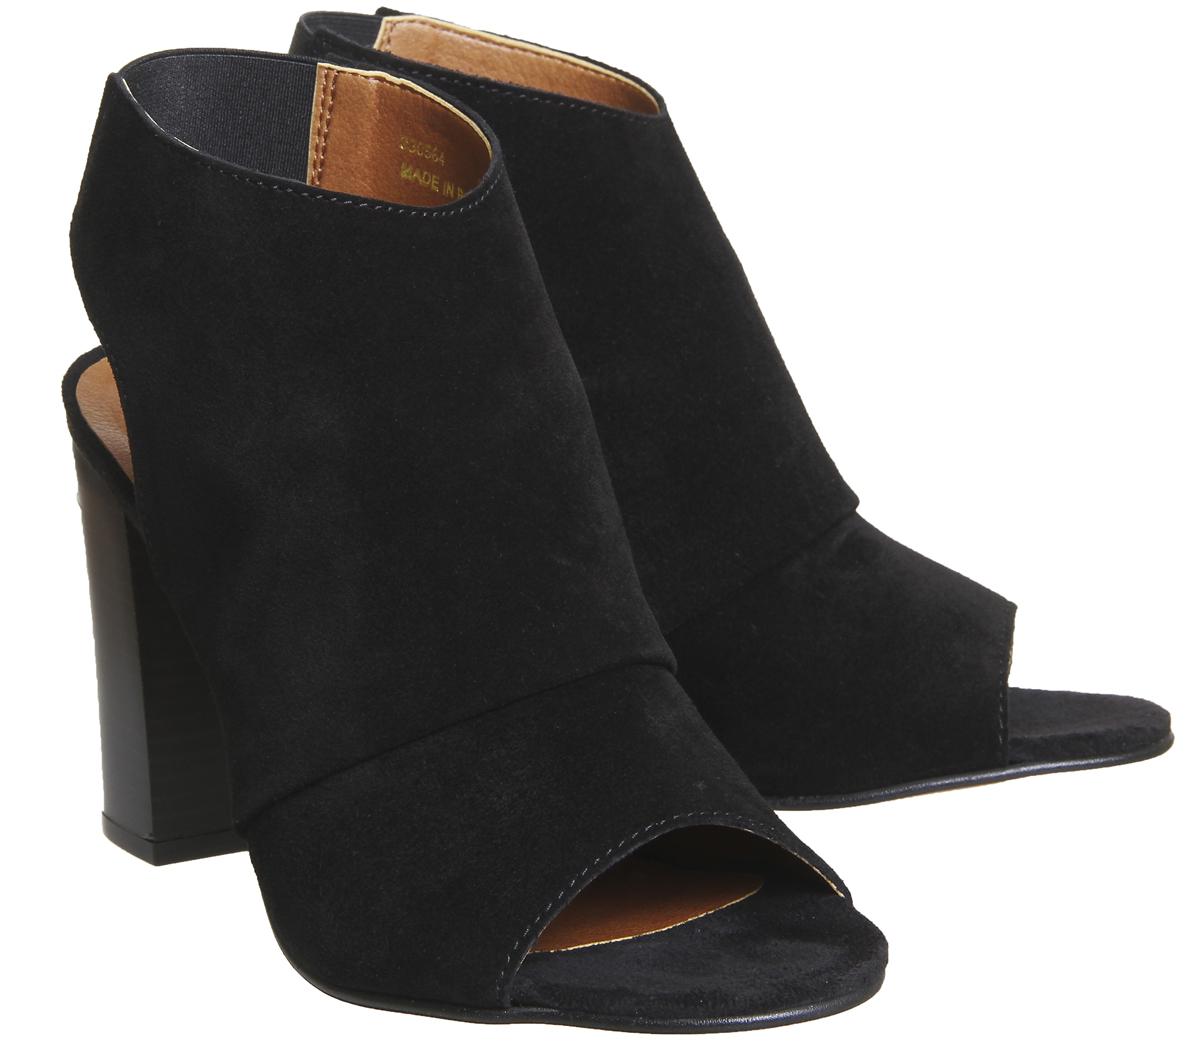 Damenschuhe Schuhe Office Hysterical Block Heel Schuhe Damenschuhe Stiefel BLACK SUEDE Heels 50ec22